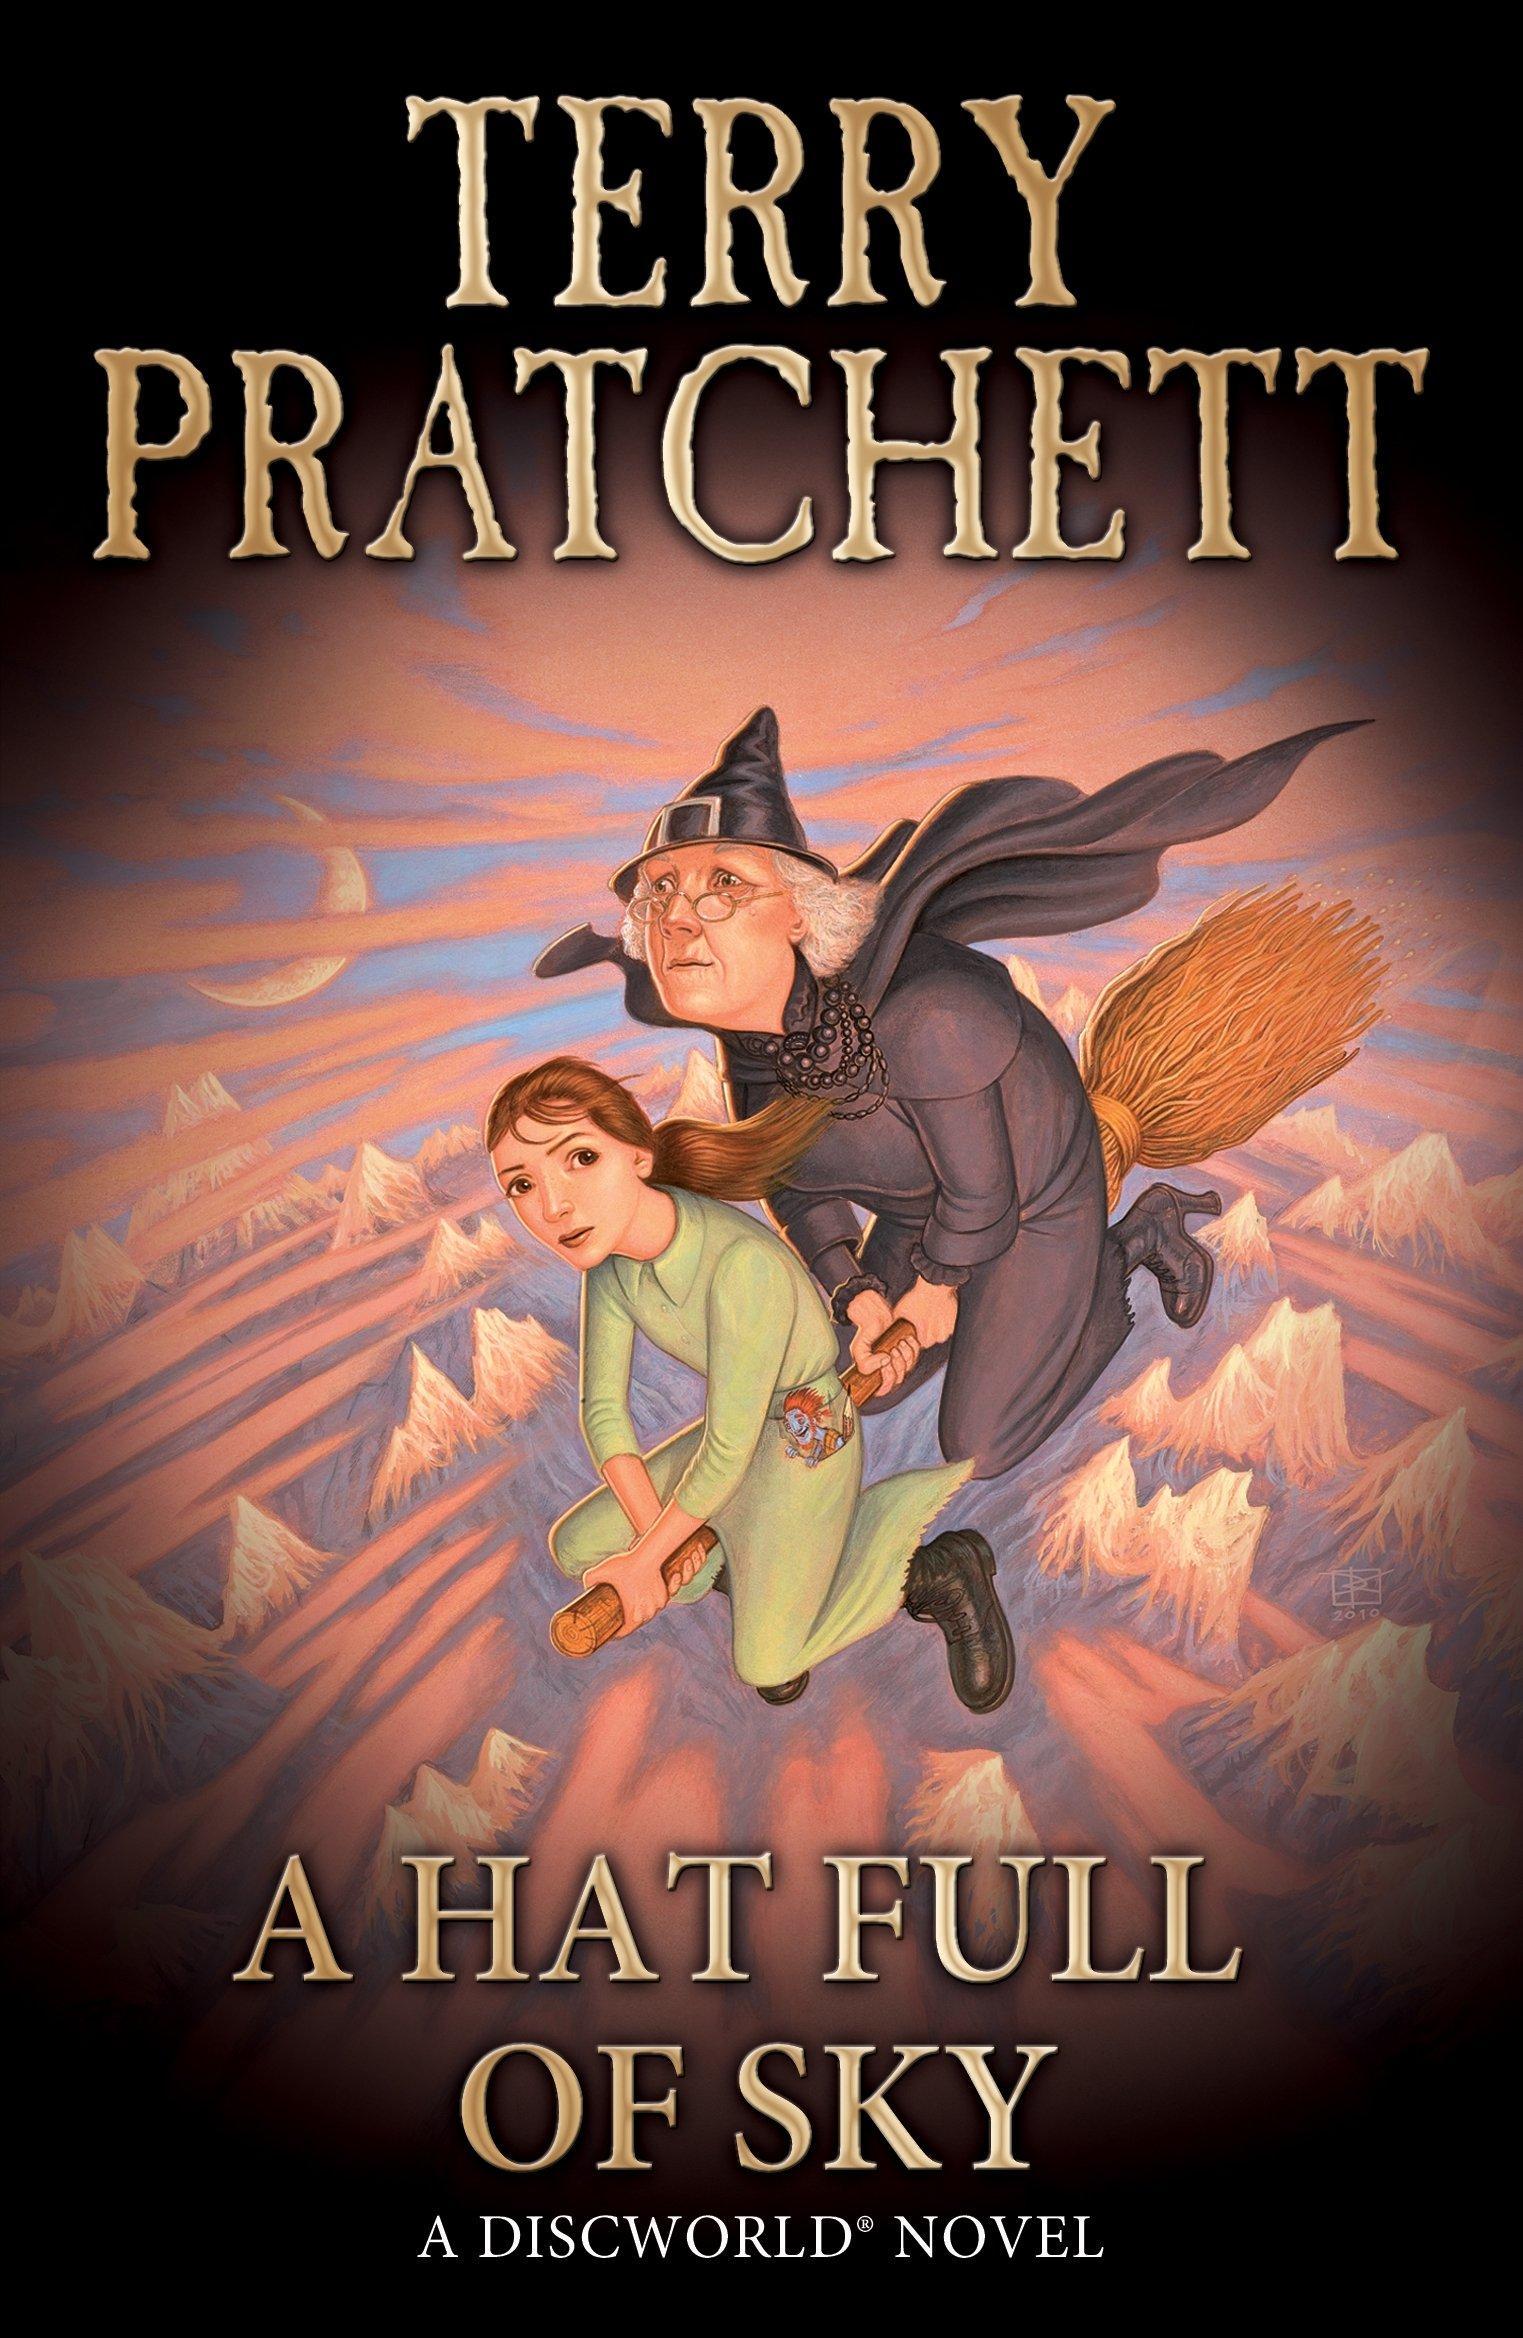 A Hat Full of Sky (Discworld Novels, Band 32)